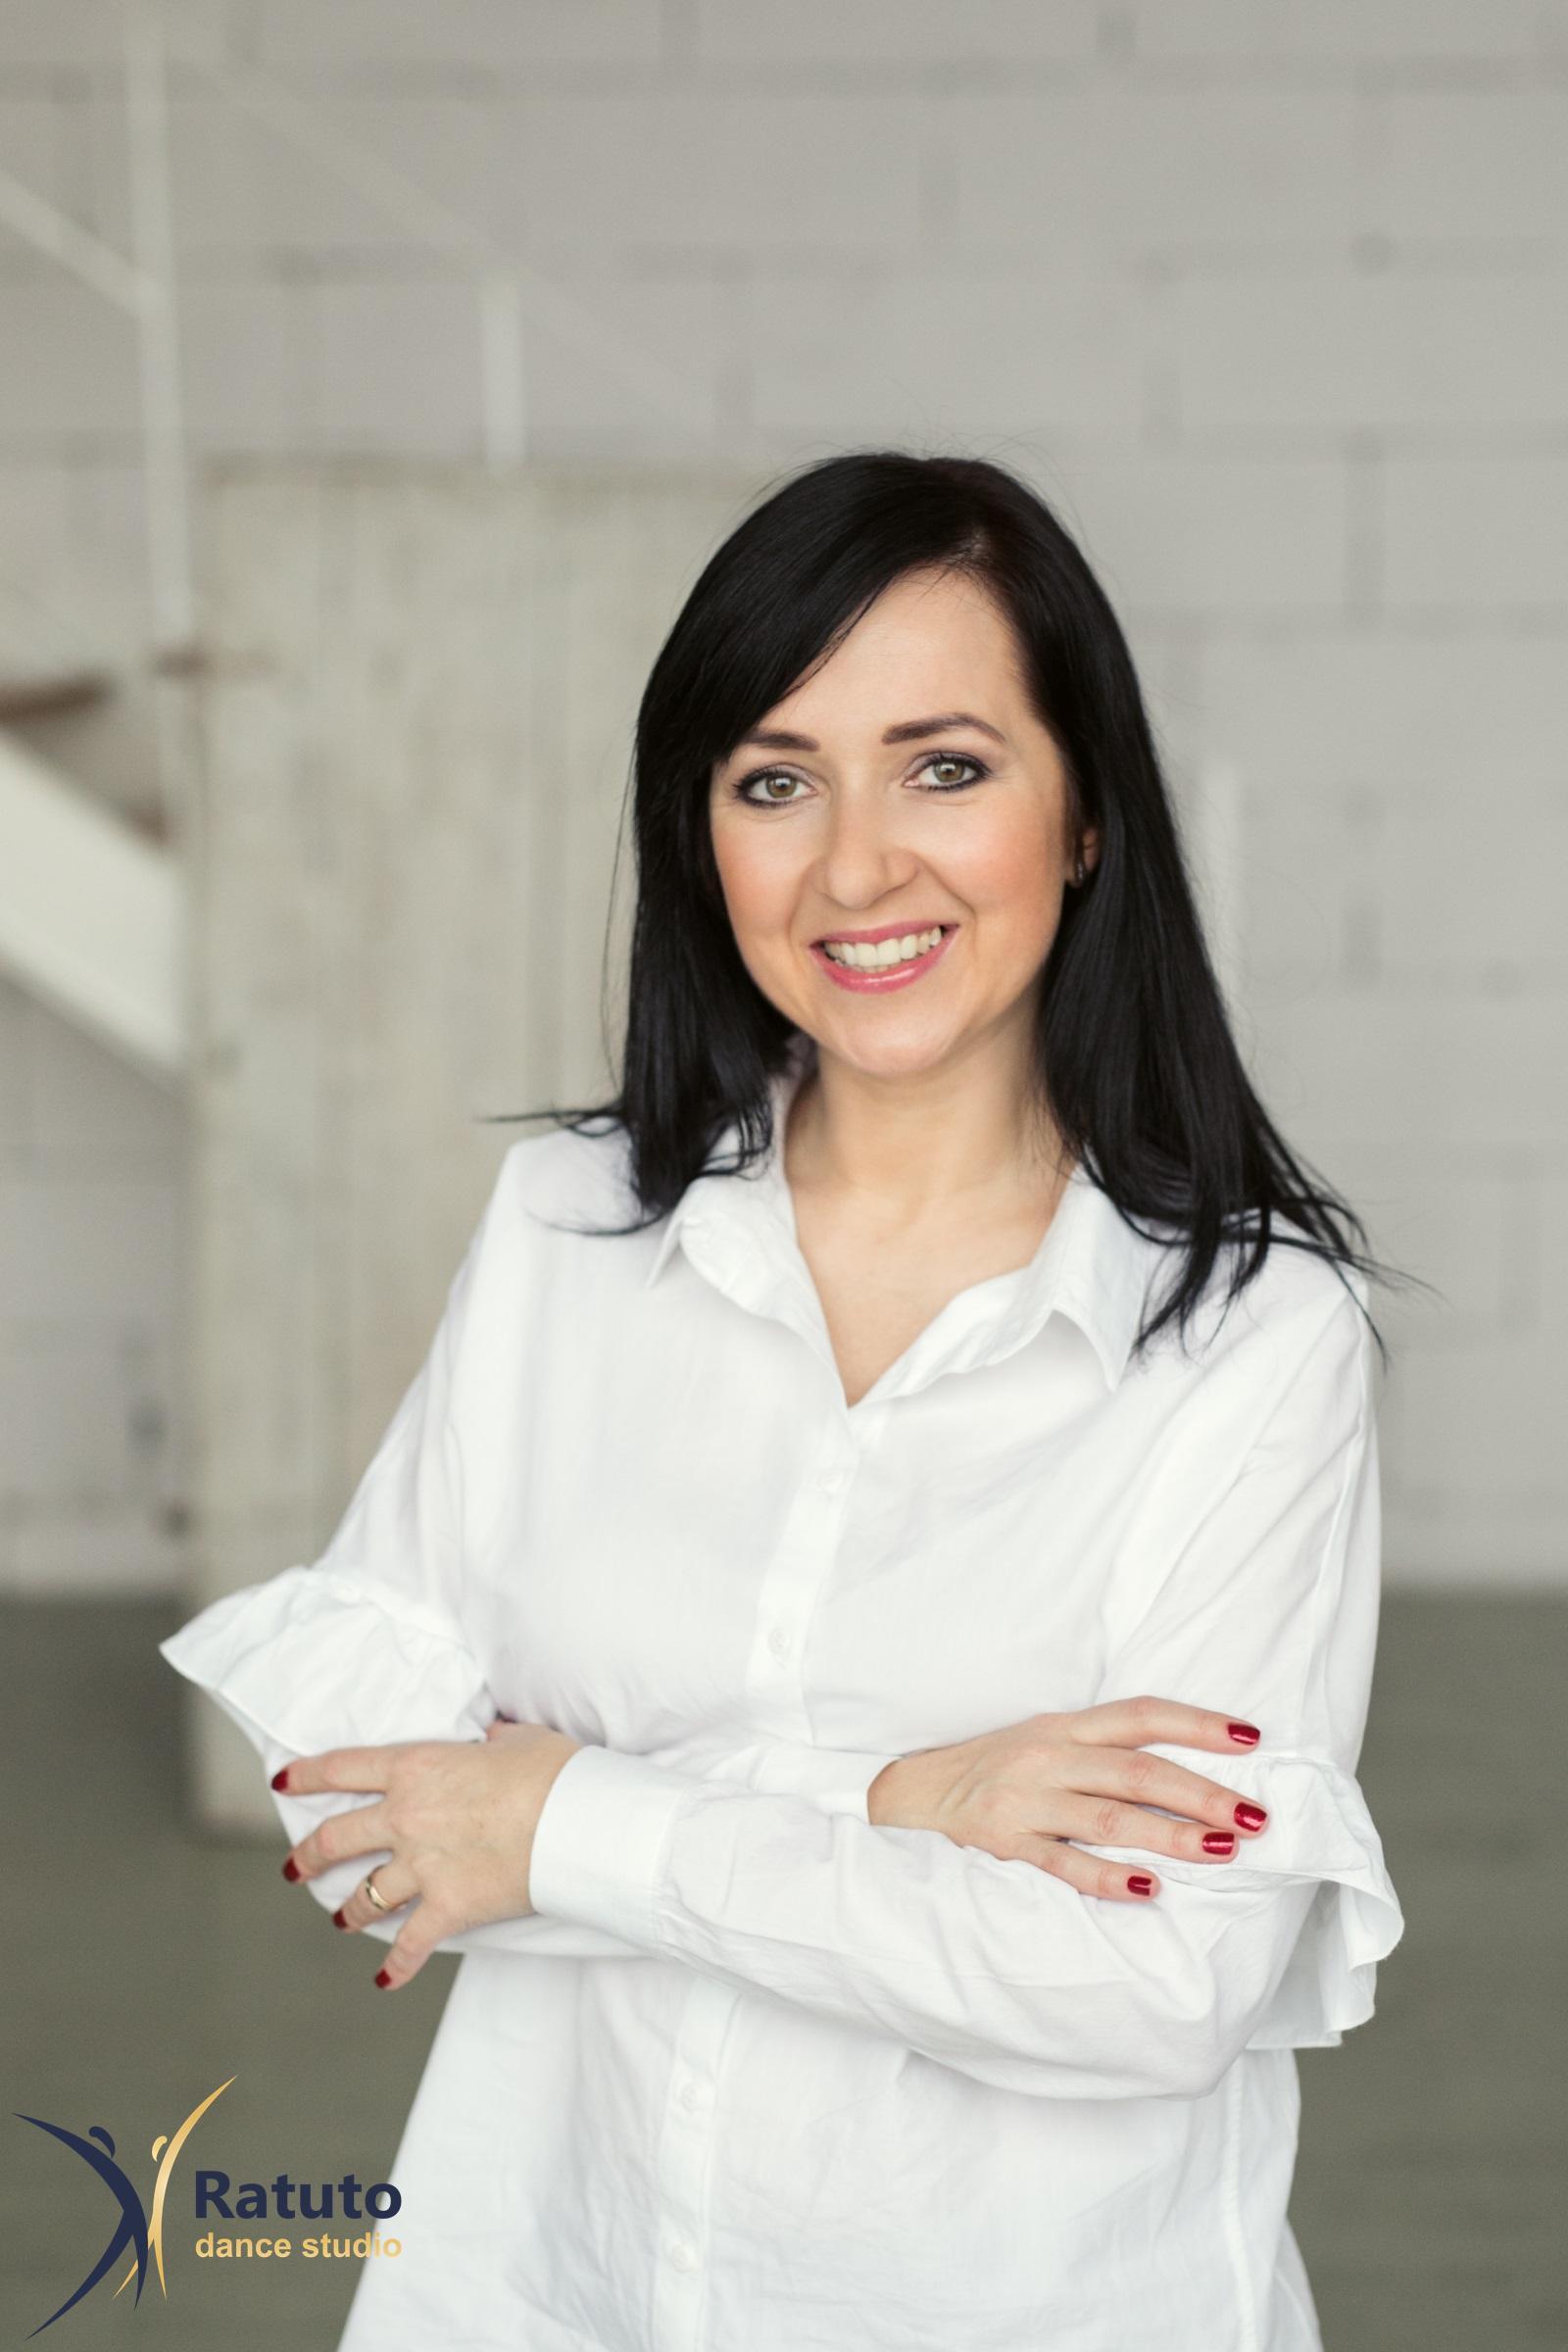 Eglė Visockaitė Damaševičienė